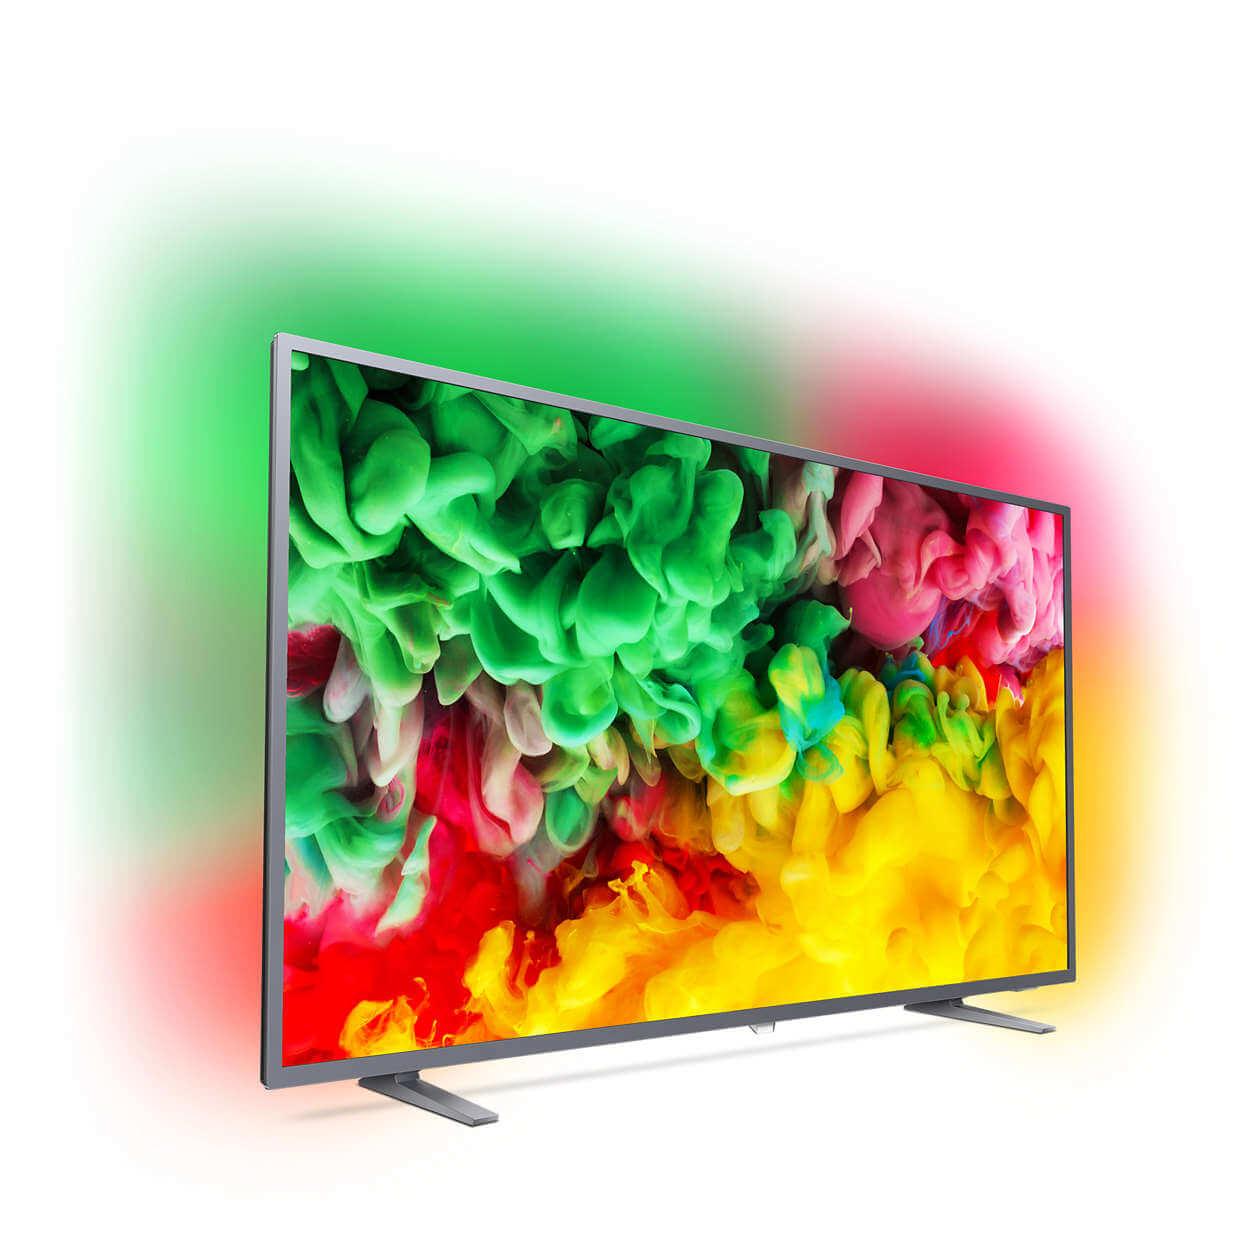 Philips 6703 6753_12 2018 Series Ultra Slim 4K TV HDR Plus HDR10 HLG Ambilight